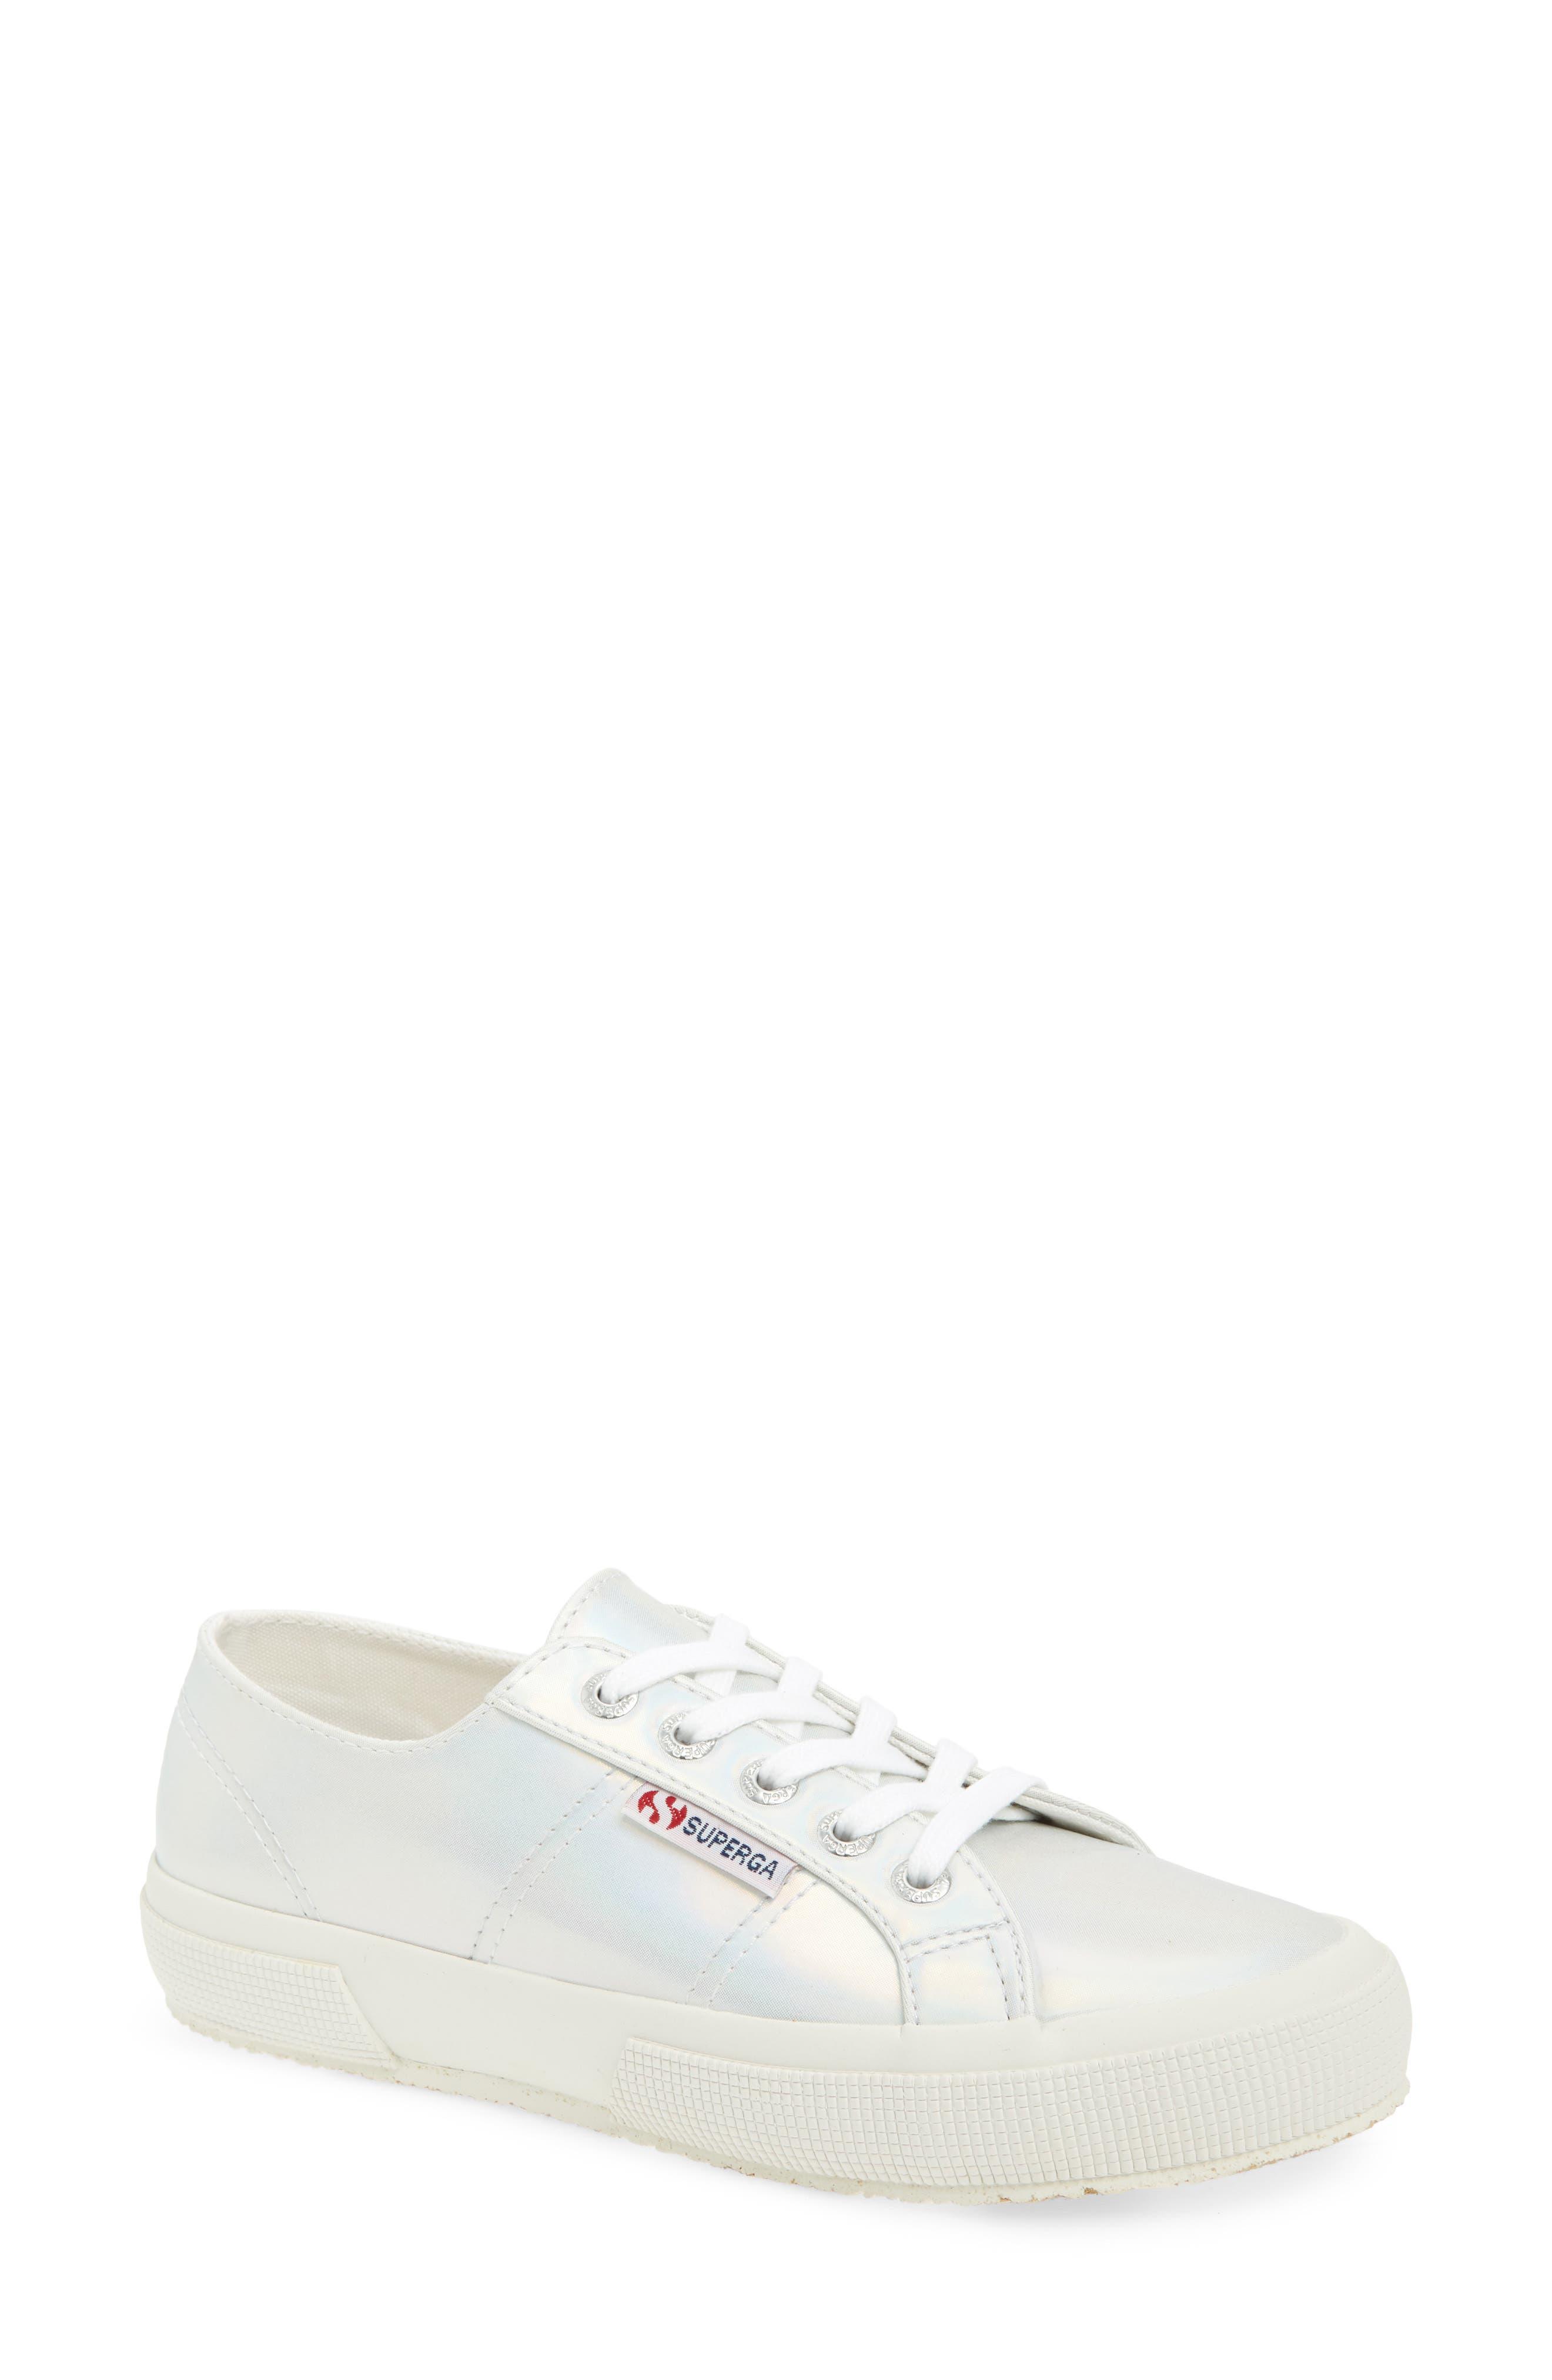 2750 Hologramw Low Top Sneaker,                             Main thumbnail 1, color,                             040